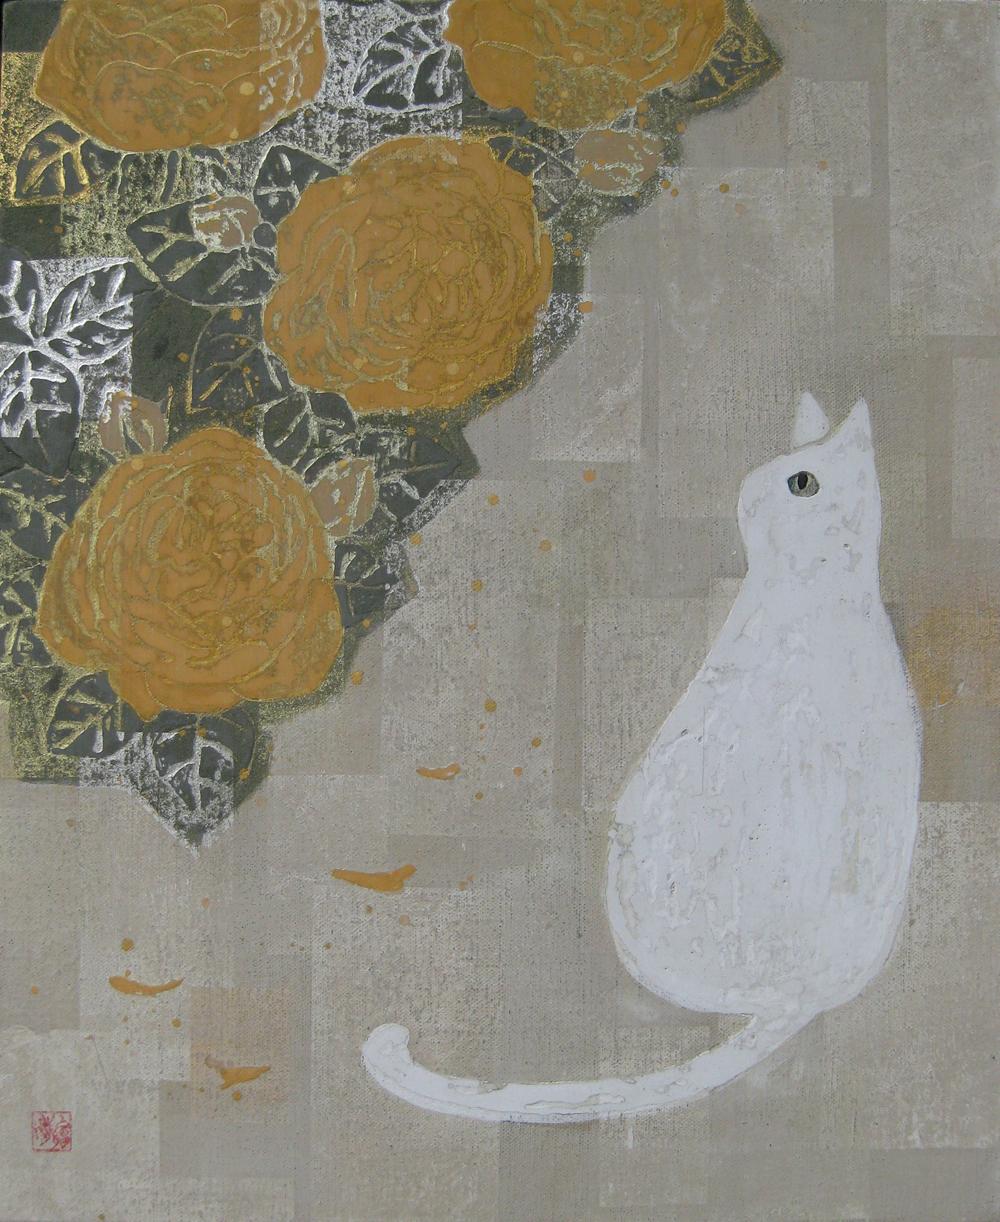 F8白猫とバラ